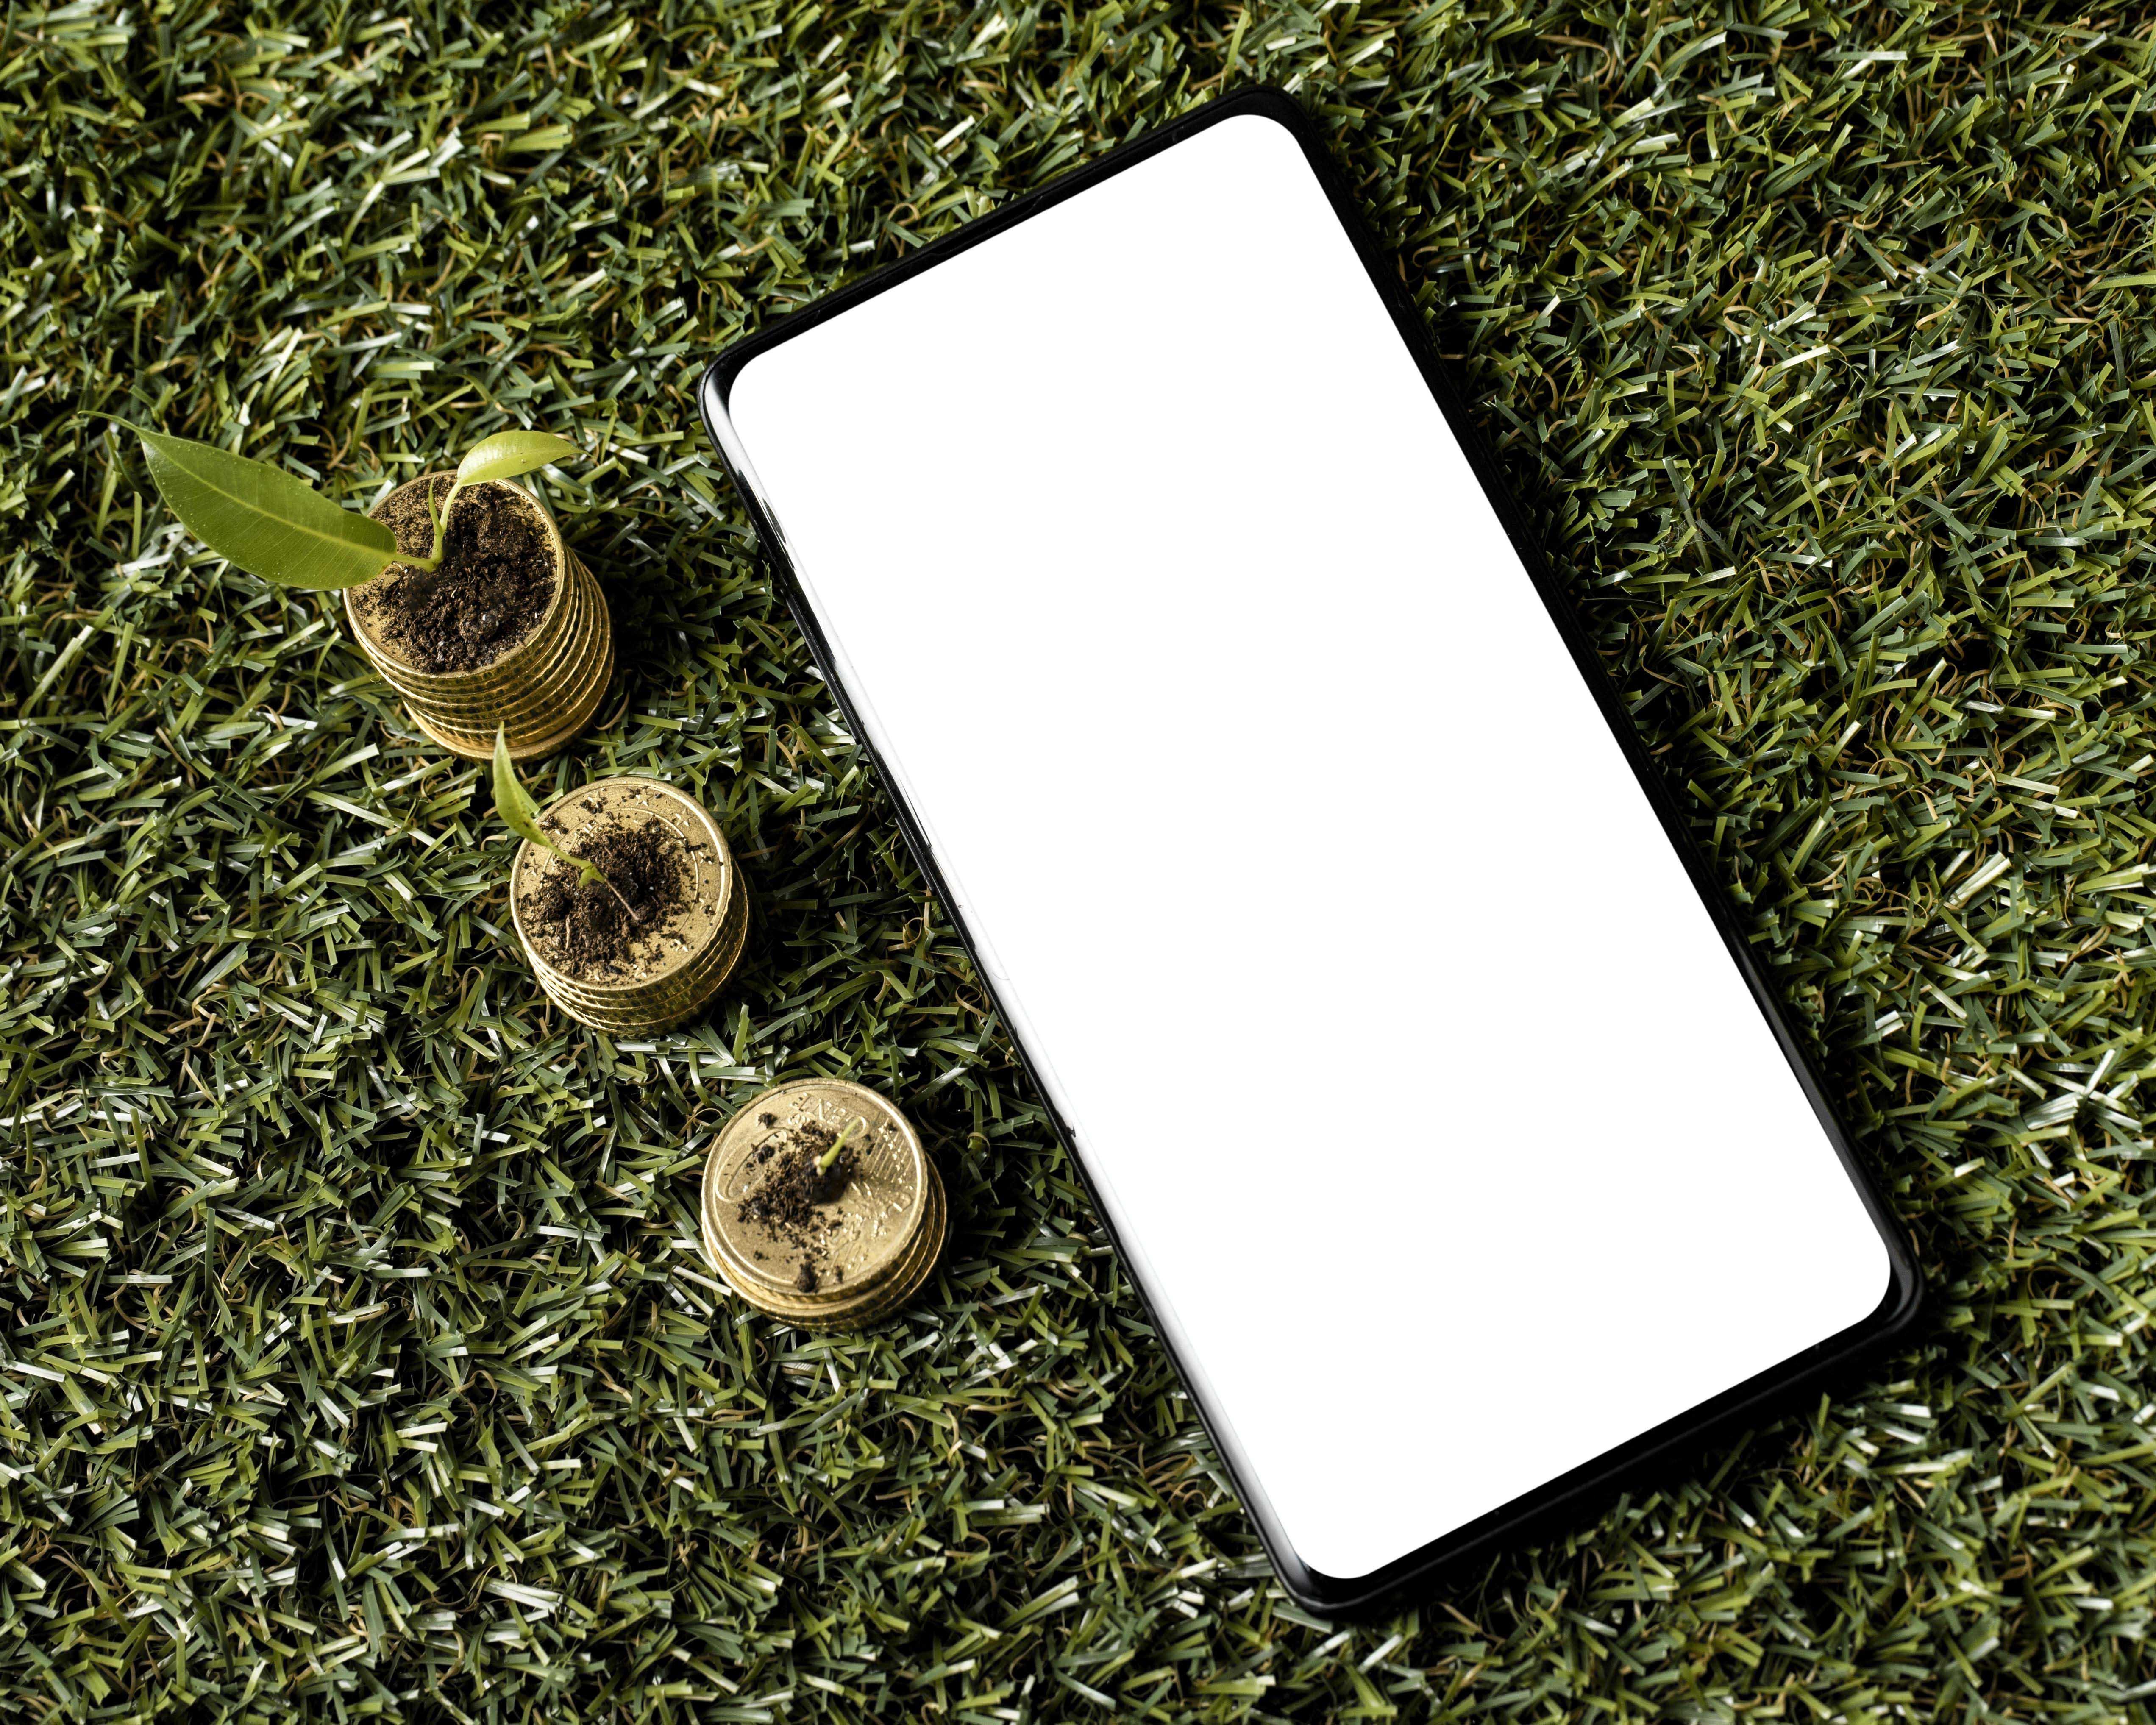 Smartphone posé dans l'herbe